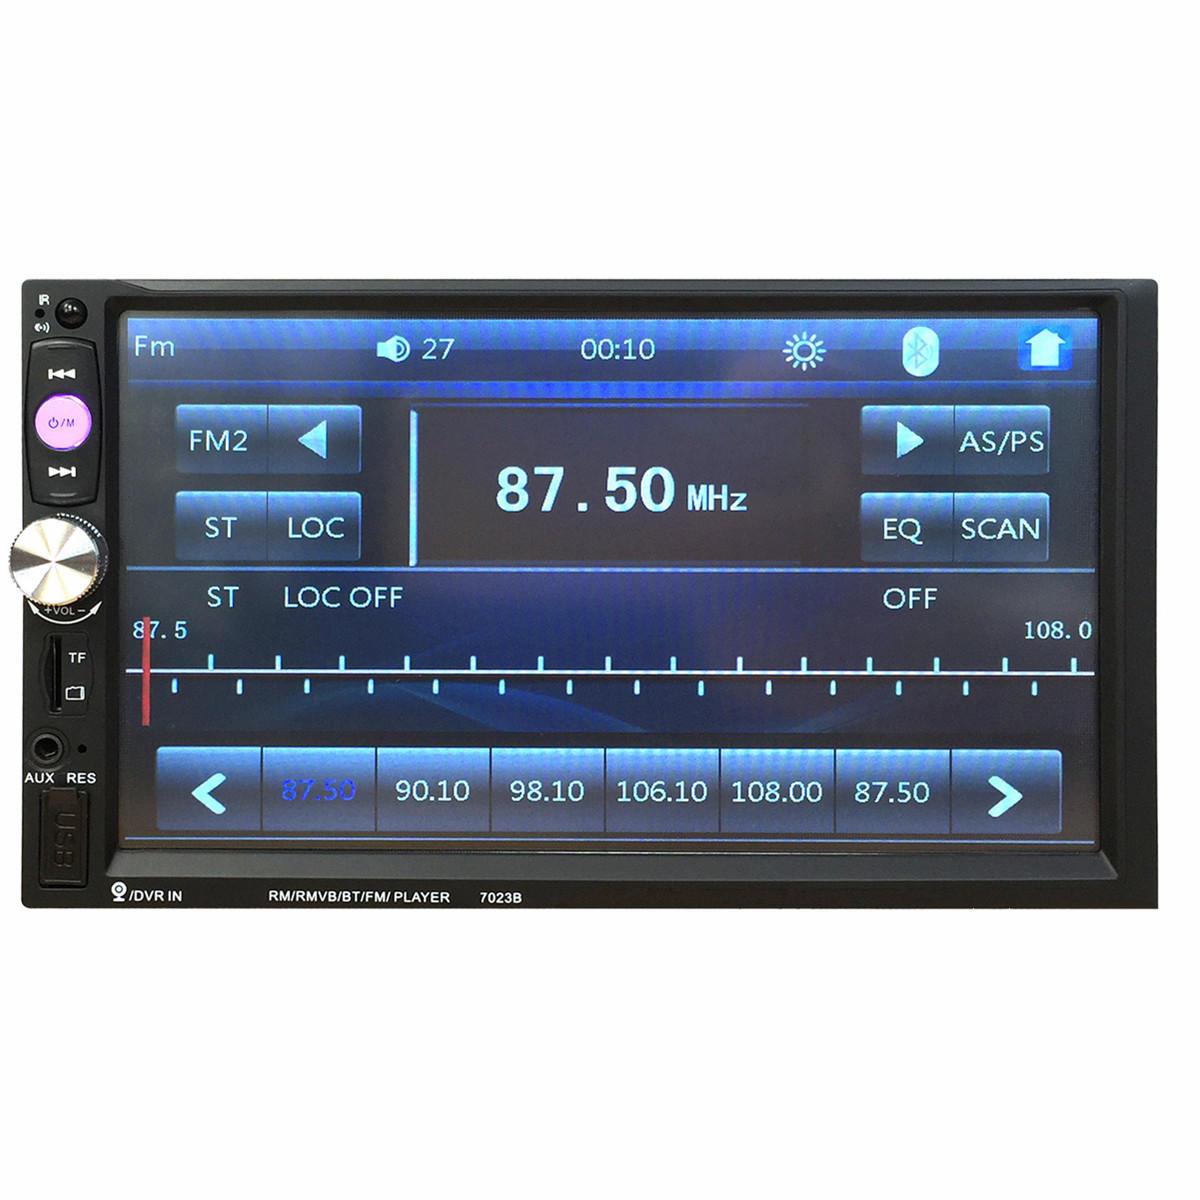 iMars 7023B radio samochodowe